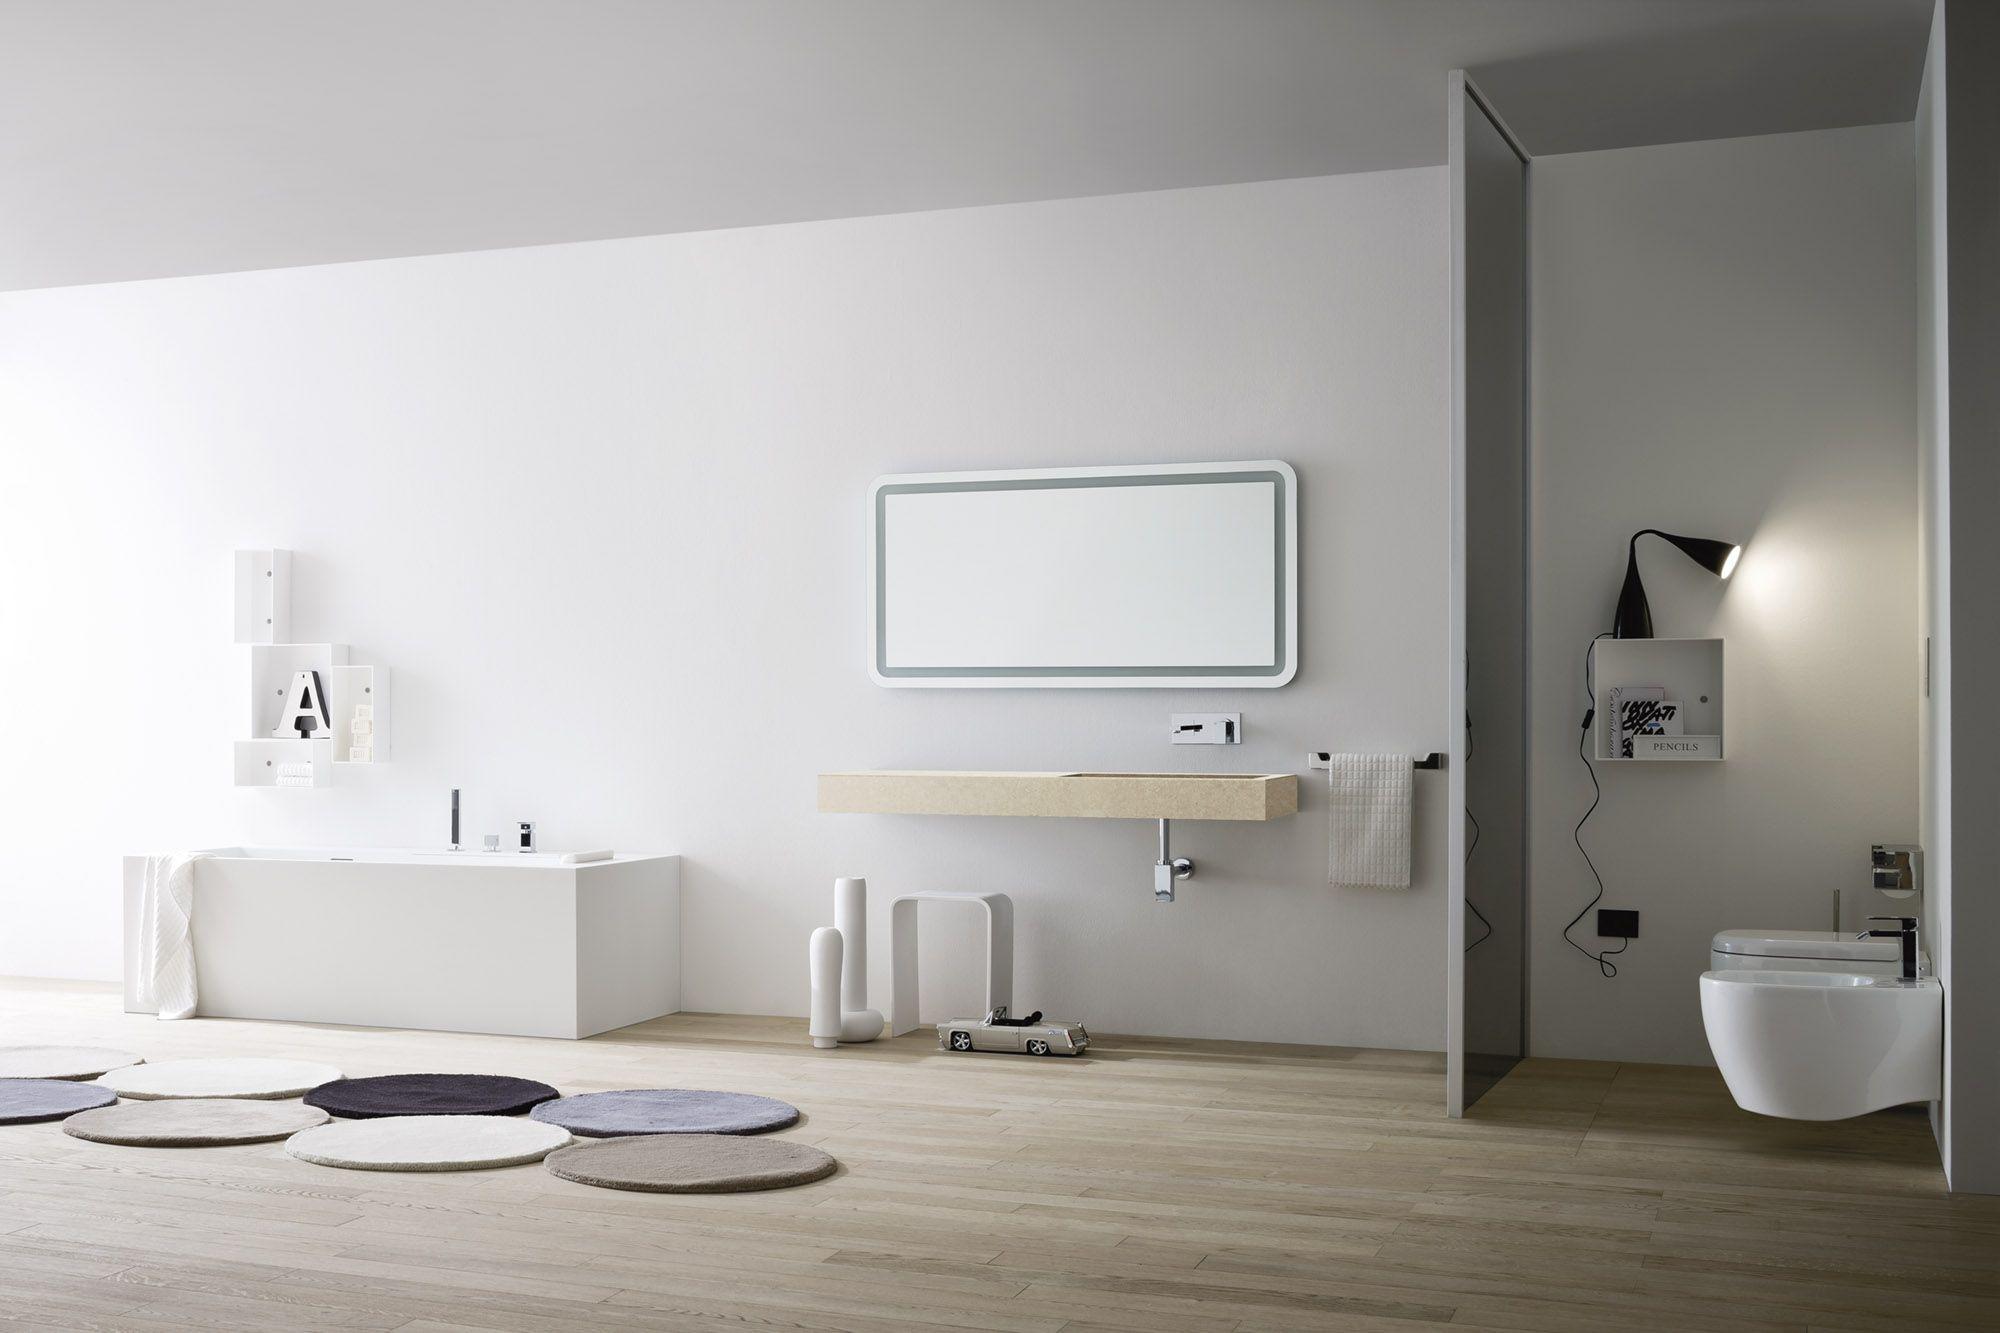 Unico lavabo de piedra by rexa design dise o imago design for Lavabo rectangular